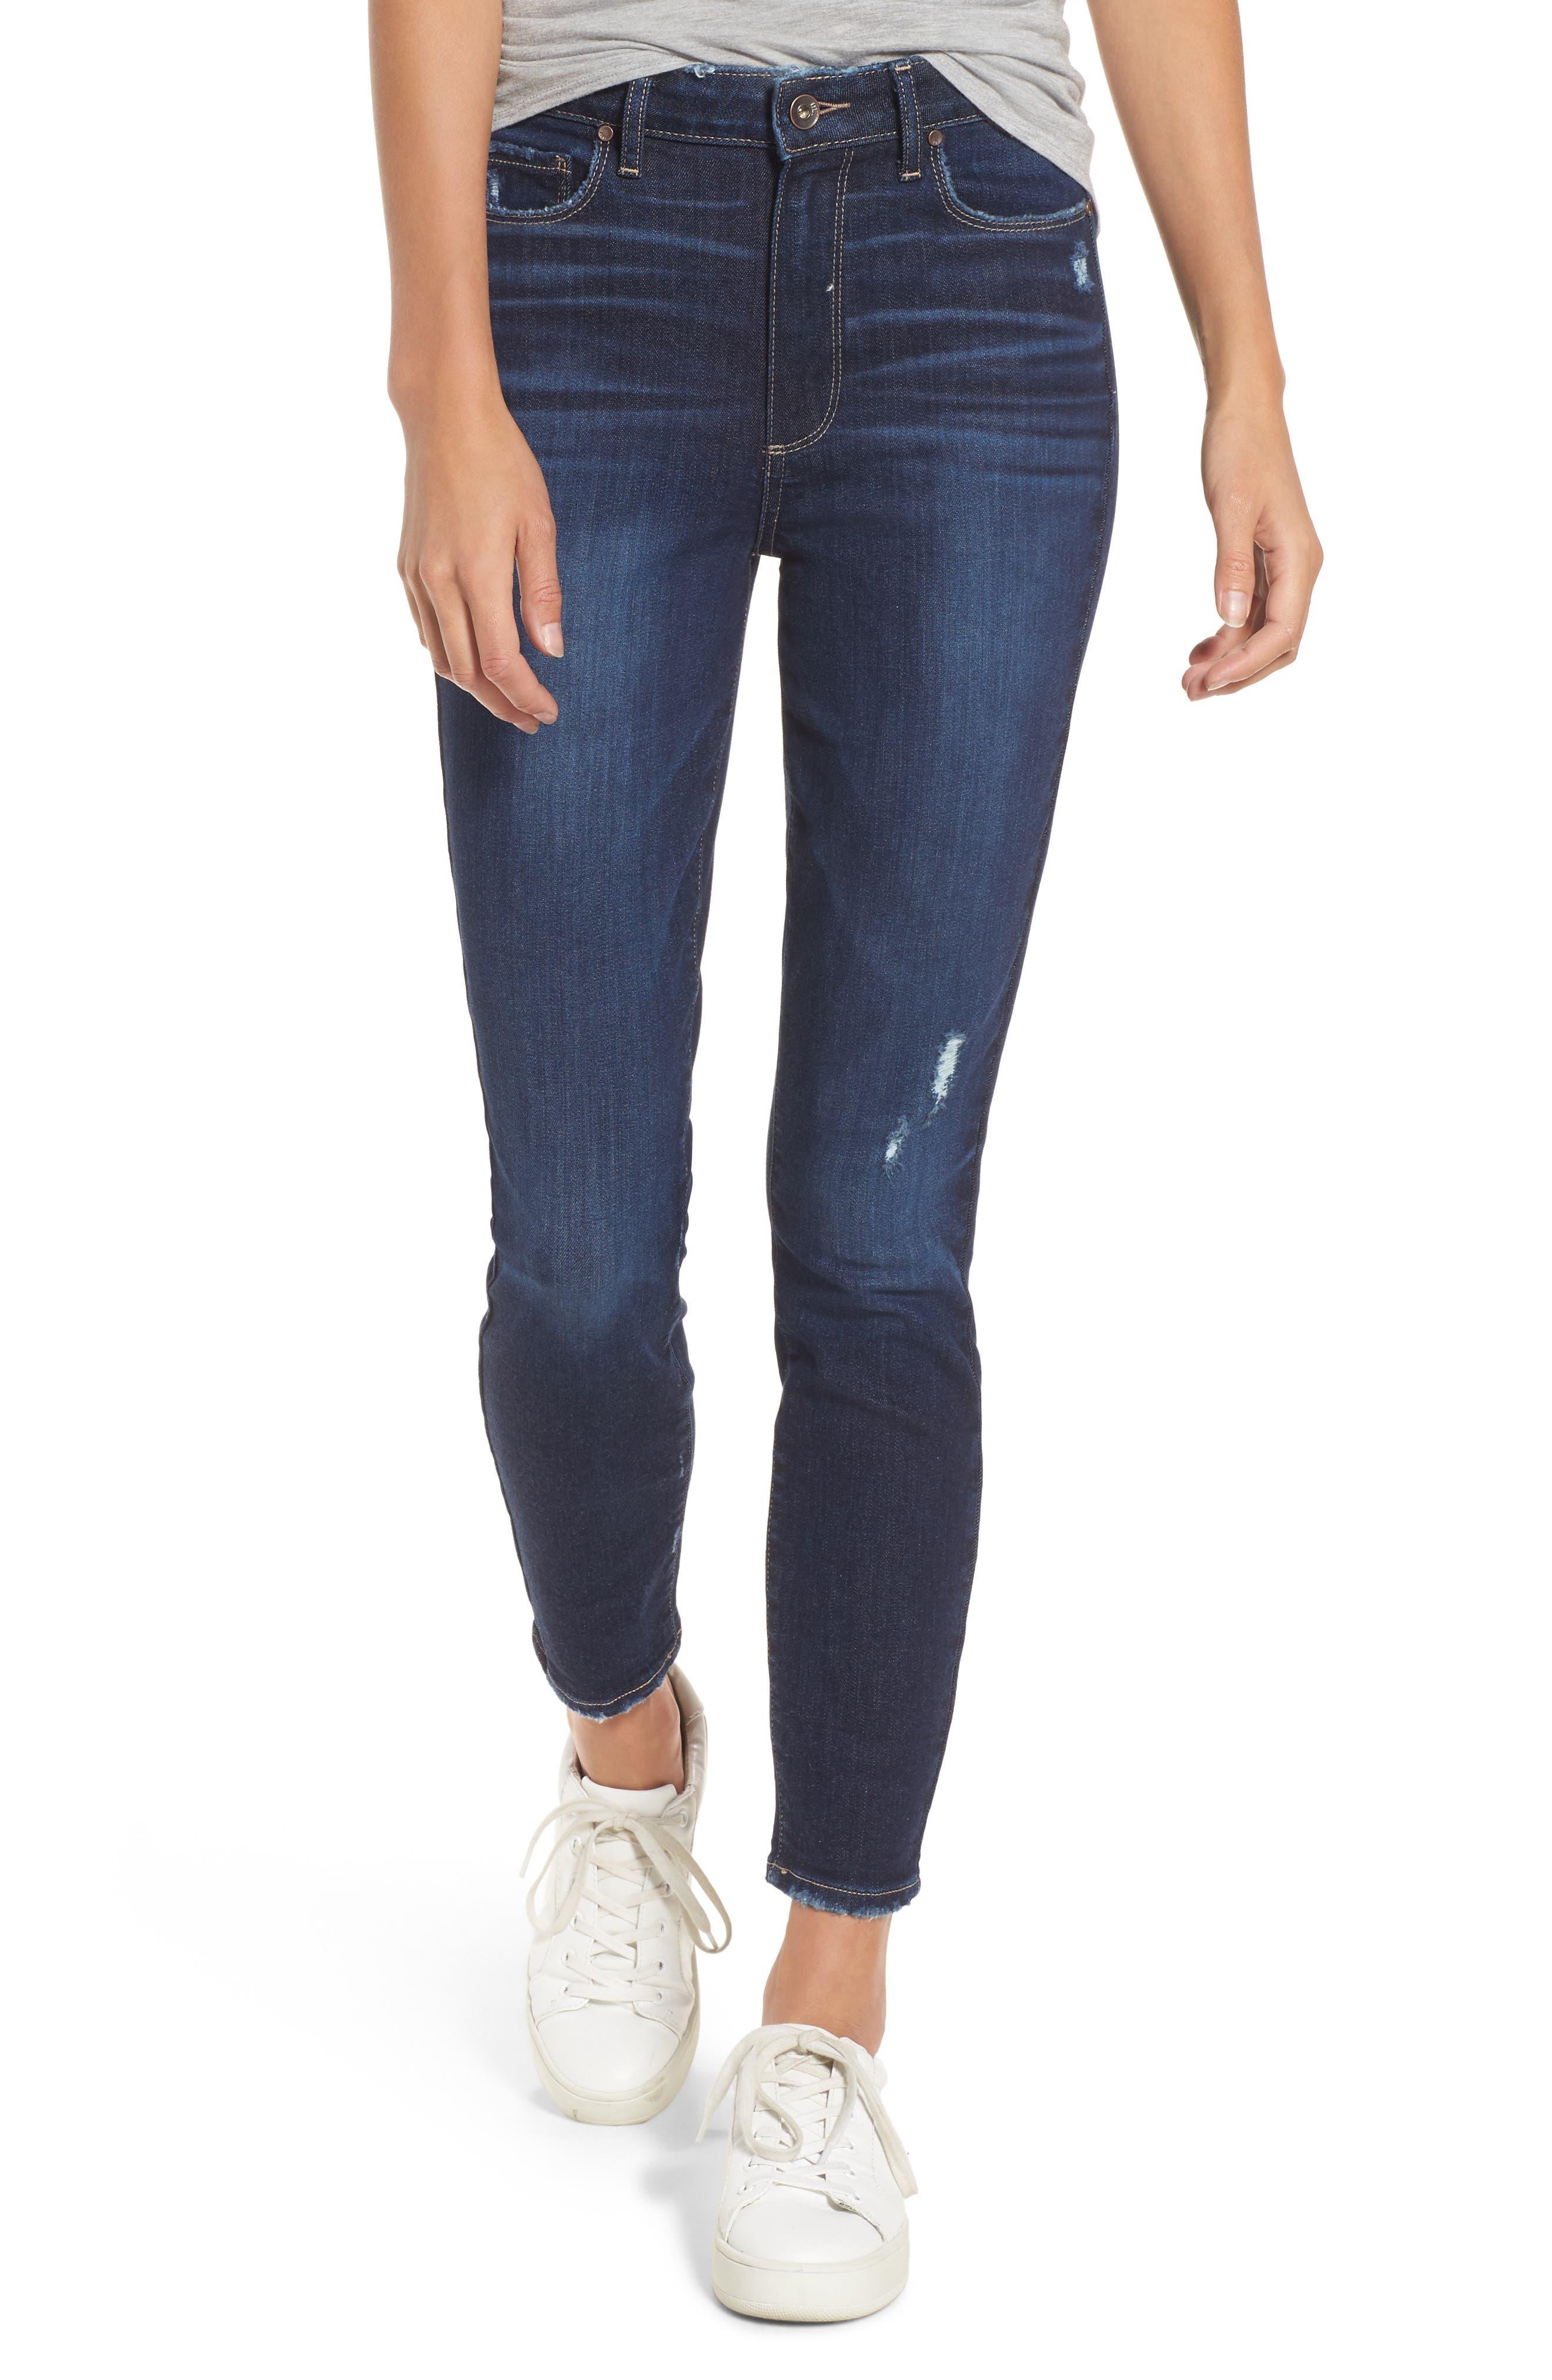 Margot High Waist Ankle Skinny Jeans,                             Main thumbnail 1, color,                             Davidson Destructed